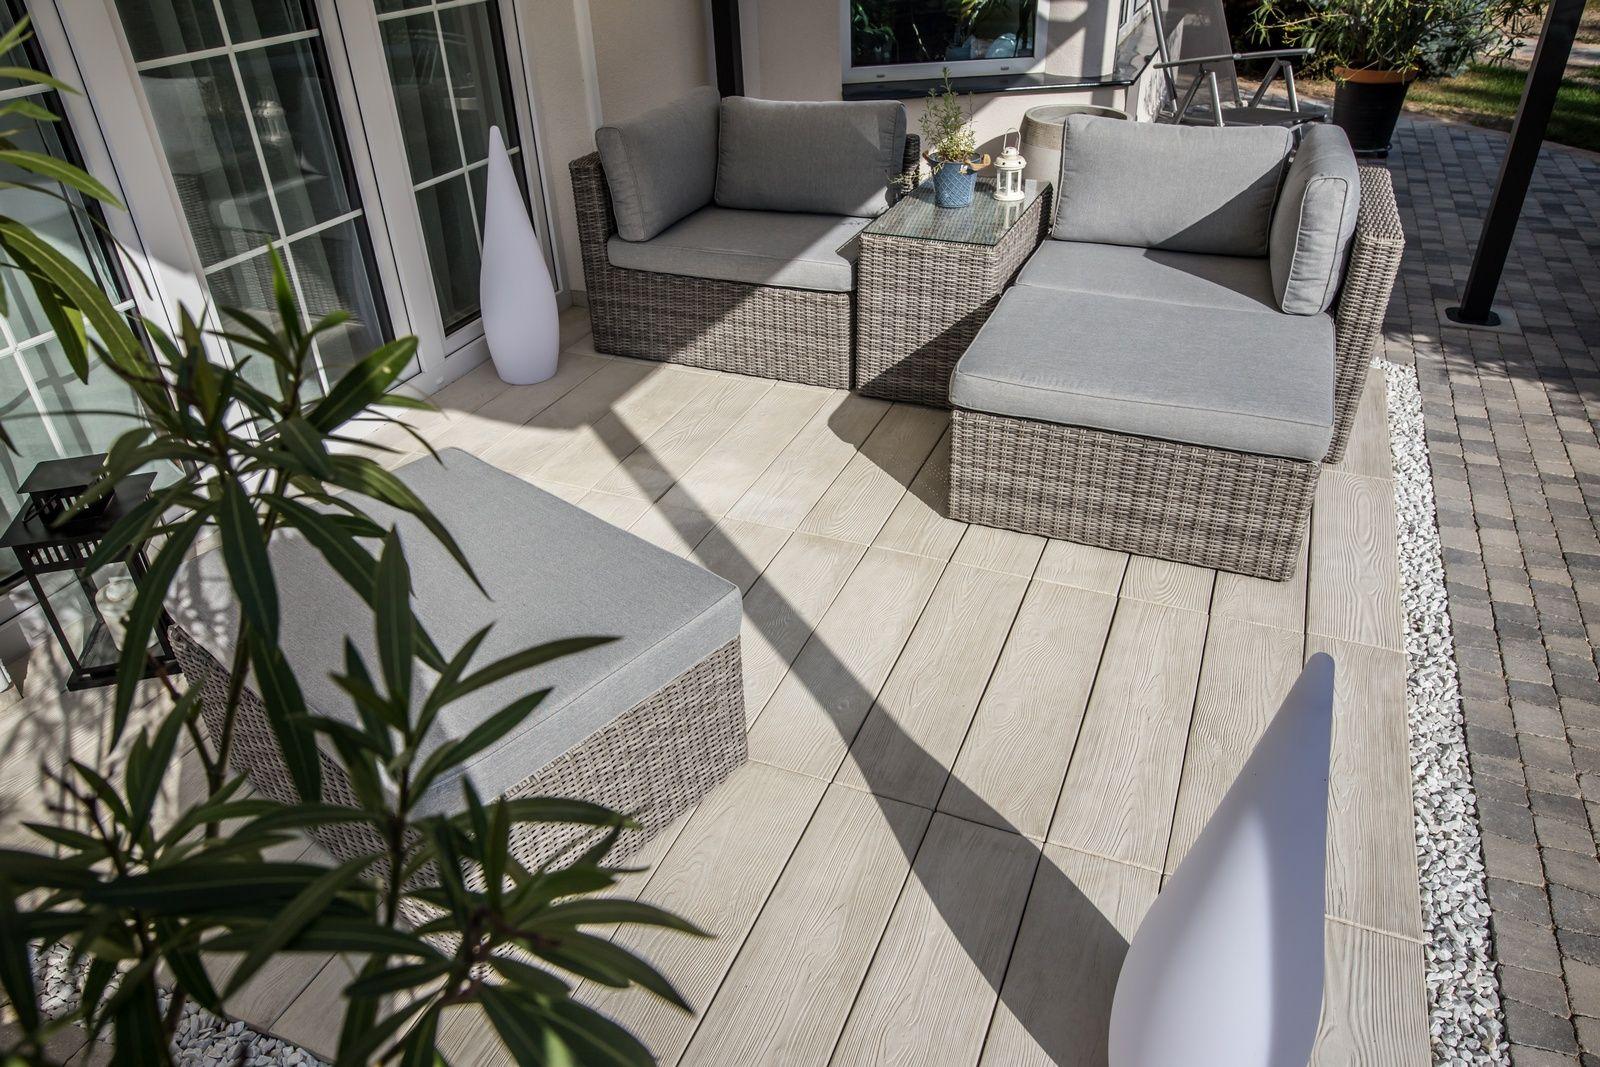 Plyty Tarasowe Madera Libet Outdoor Decor Patio Home Decor